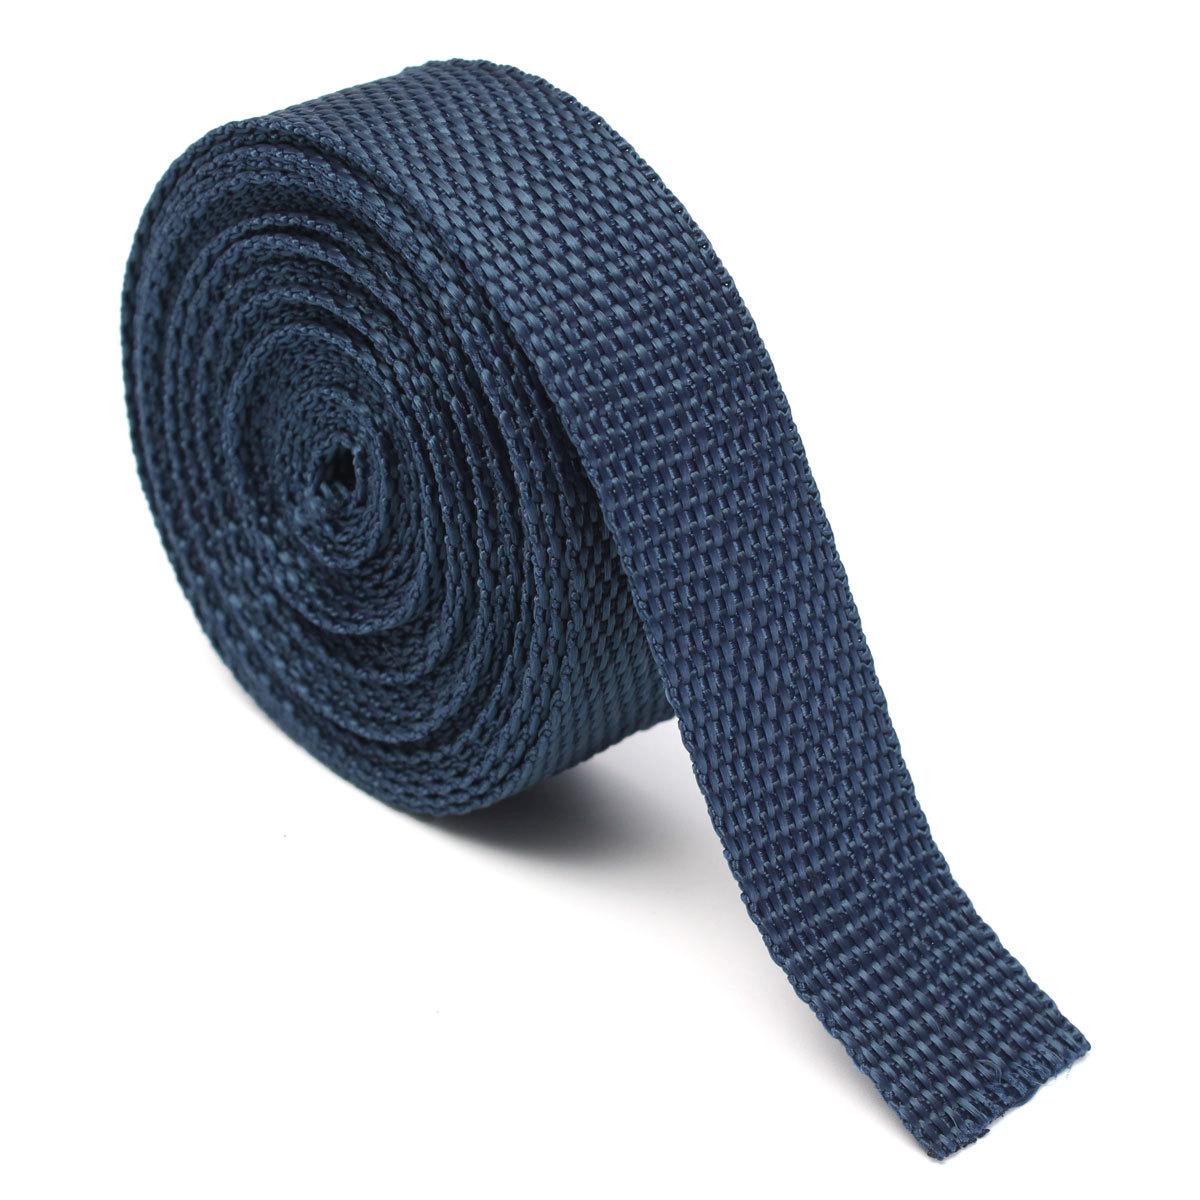 25mmx4m Roll Nylon Fabric Tape Strap Webbing Bag Binding ...